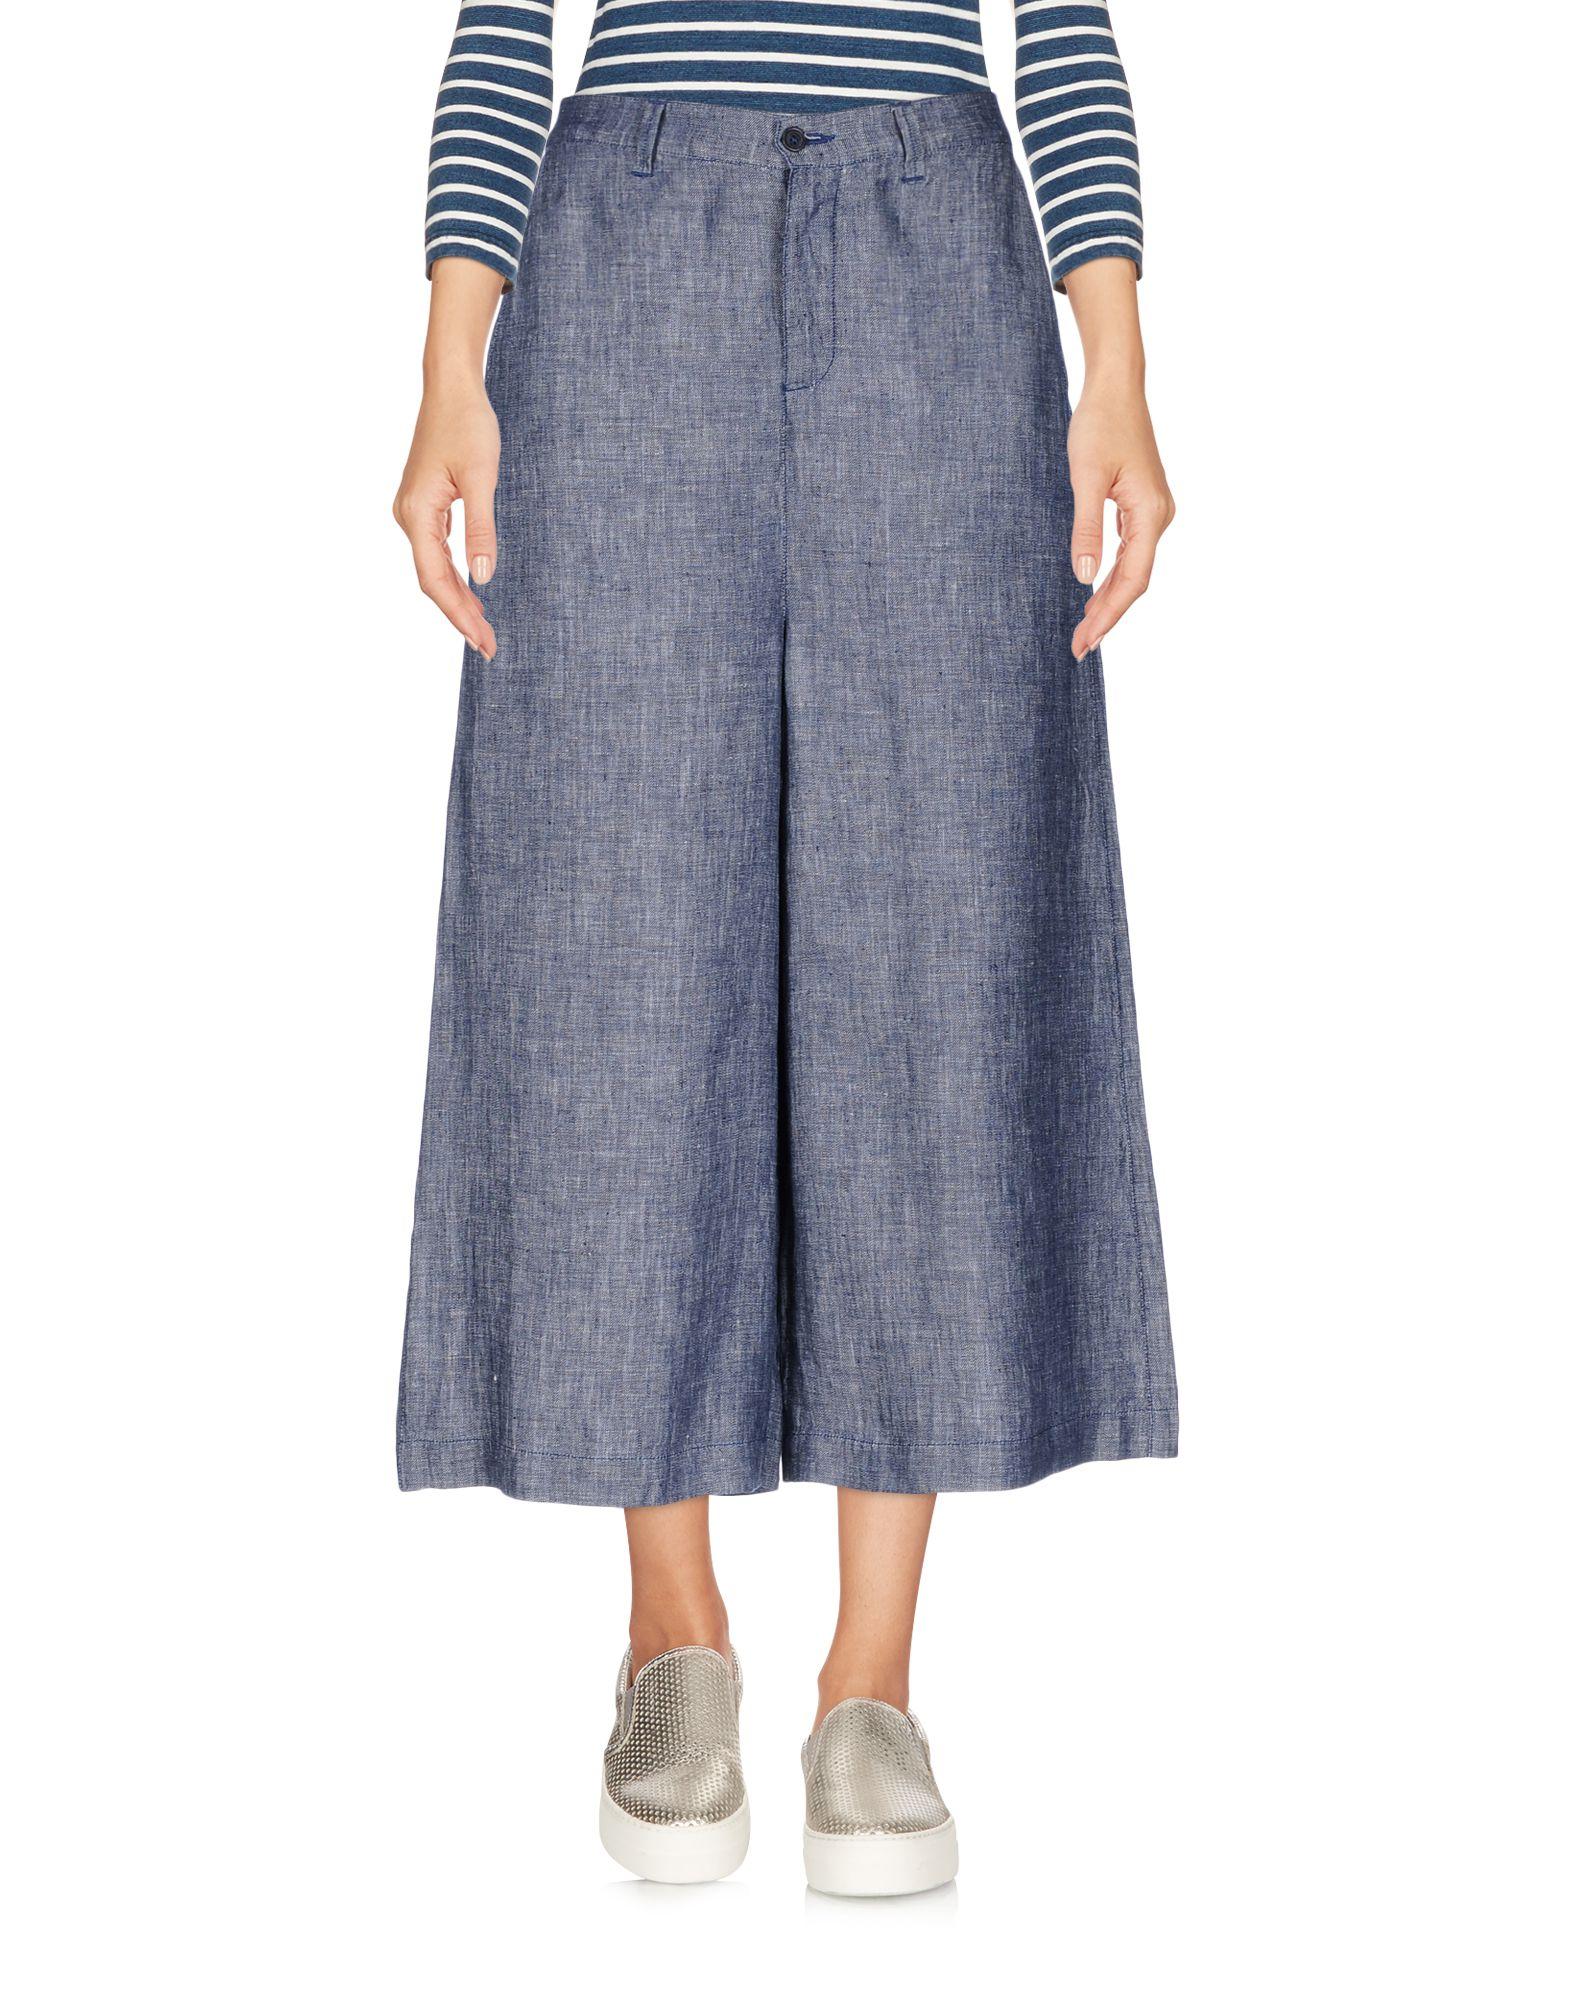 120% Джинсовые брюки-капри капри